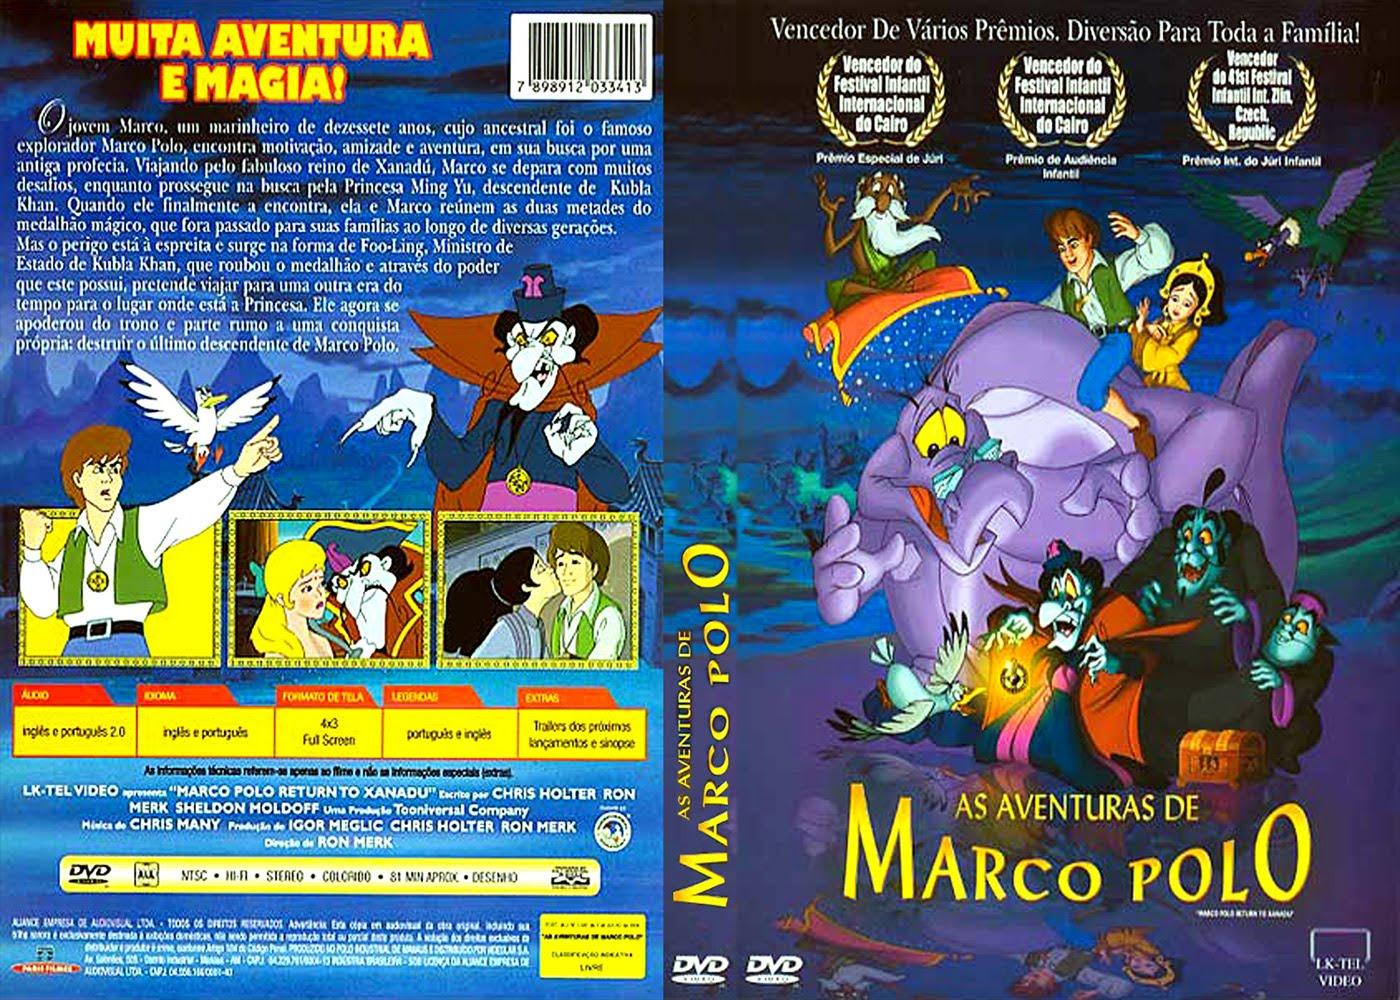 http://1.bp.blogspot.com/_d6xvEECraP0/TAKPtt_-YHI/AAAAAAAAAFk/RhHYCLkQuKM/s1600/As-Aventuras-De-Marco-Polo.jpg